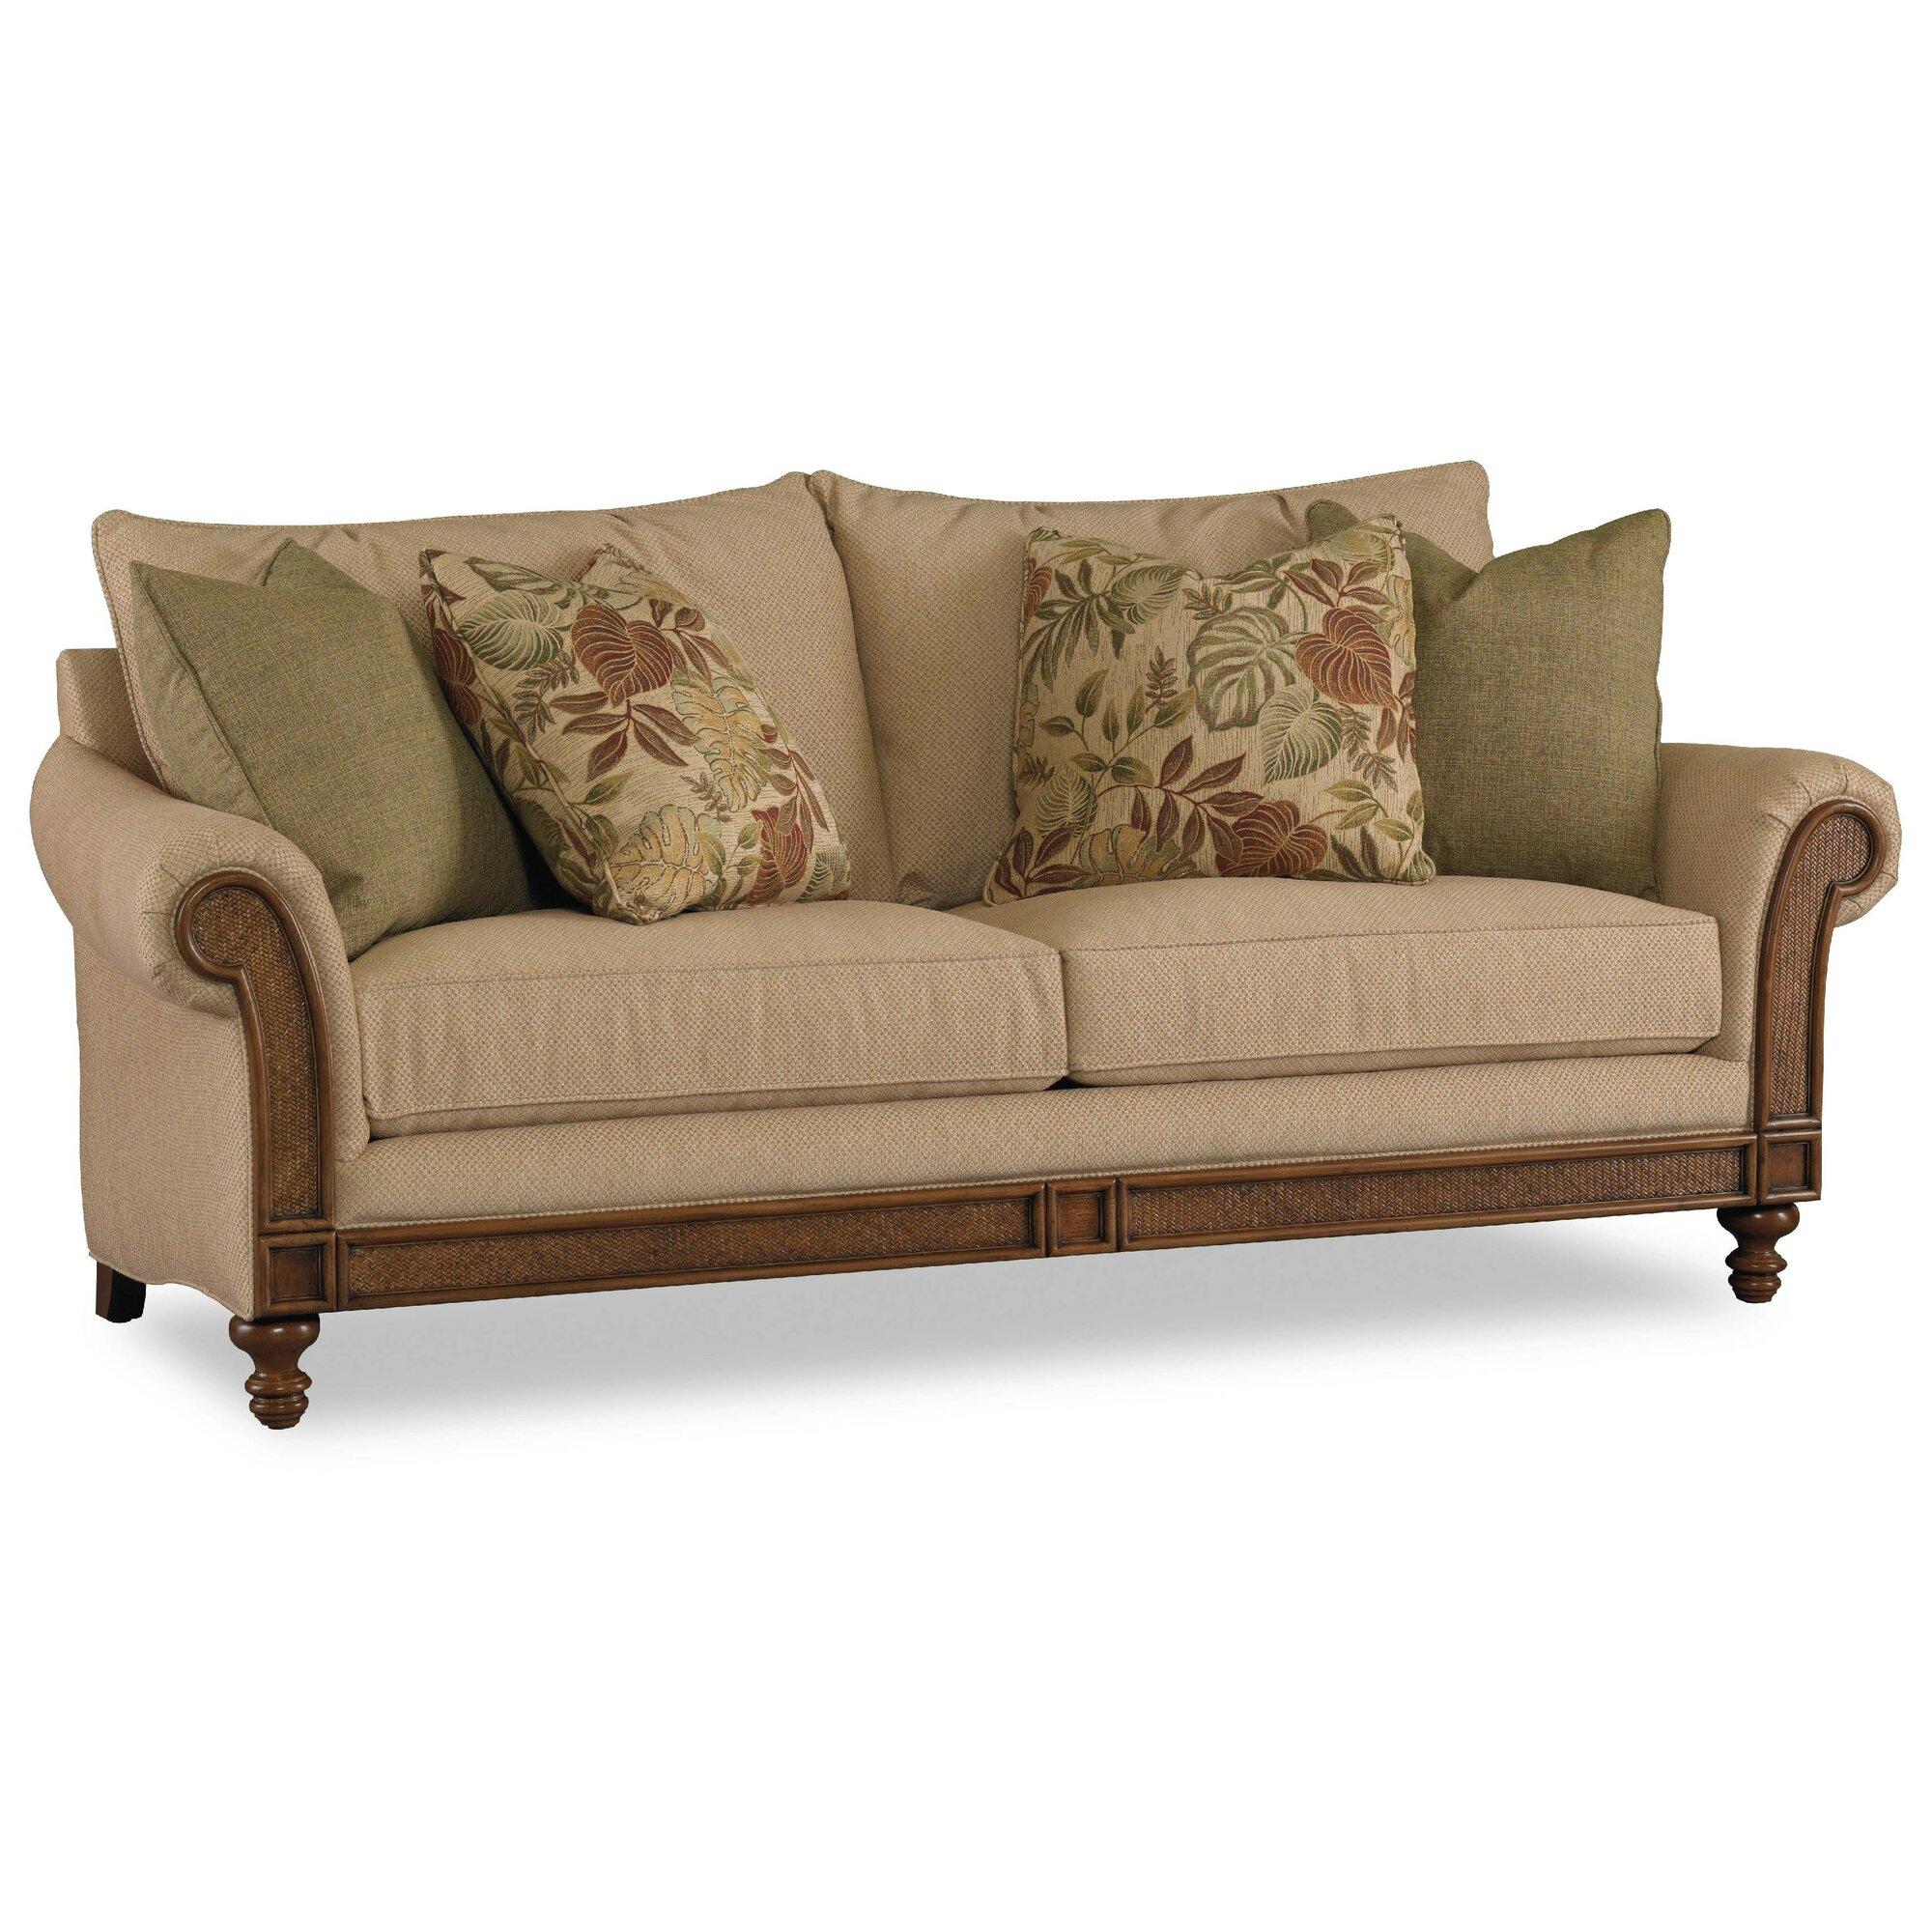 Wayfair Sofas Traditional Sofas You Ll Love Wayfair TheSofa